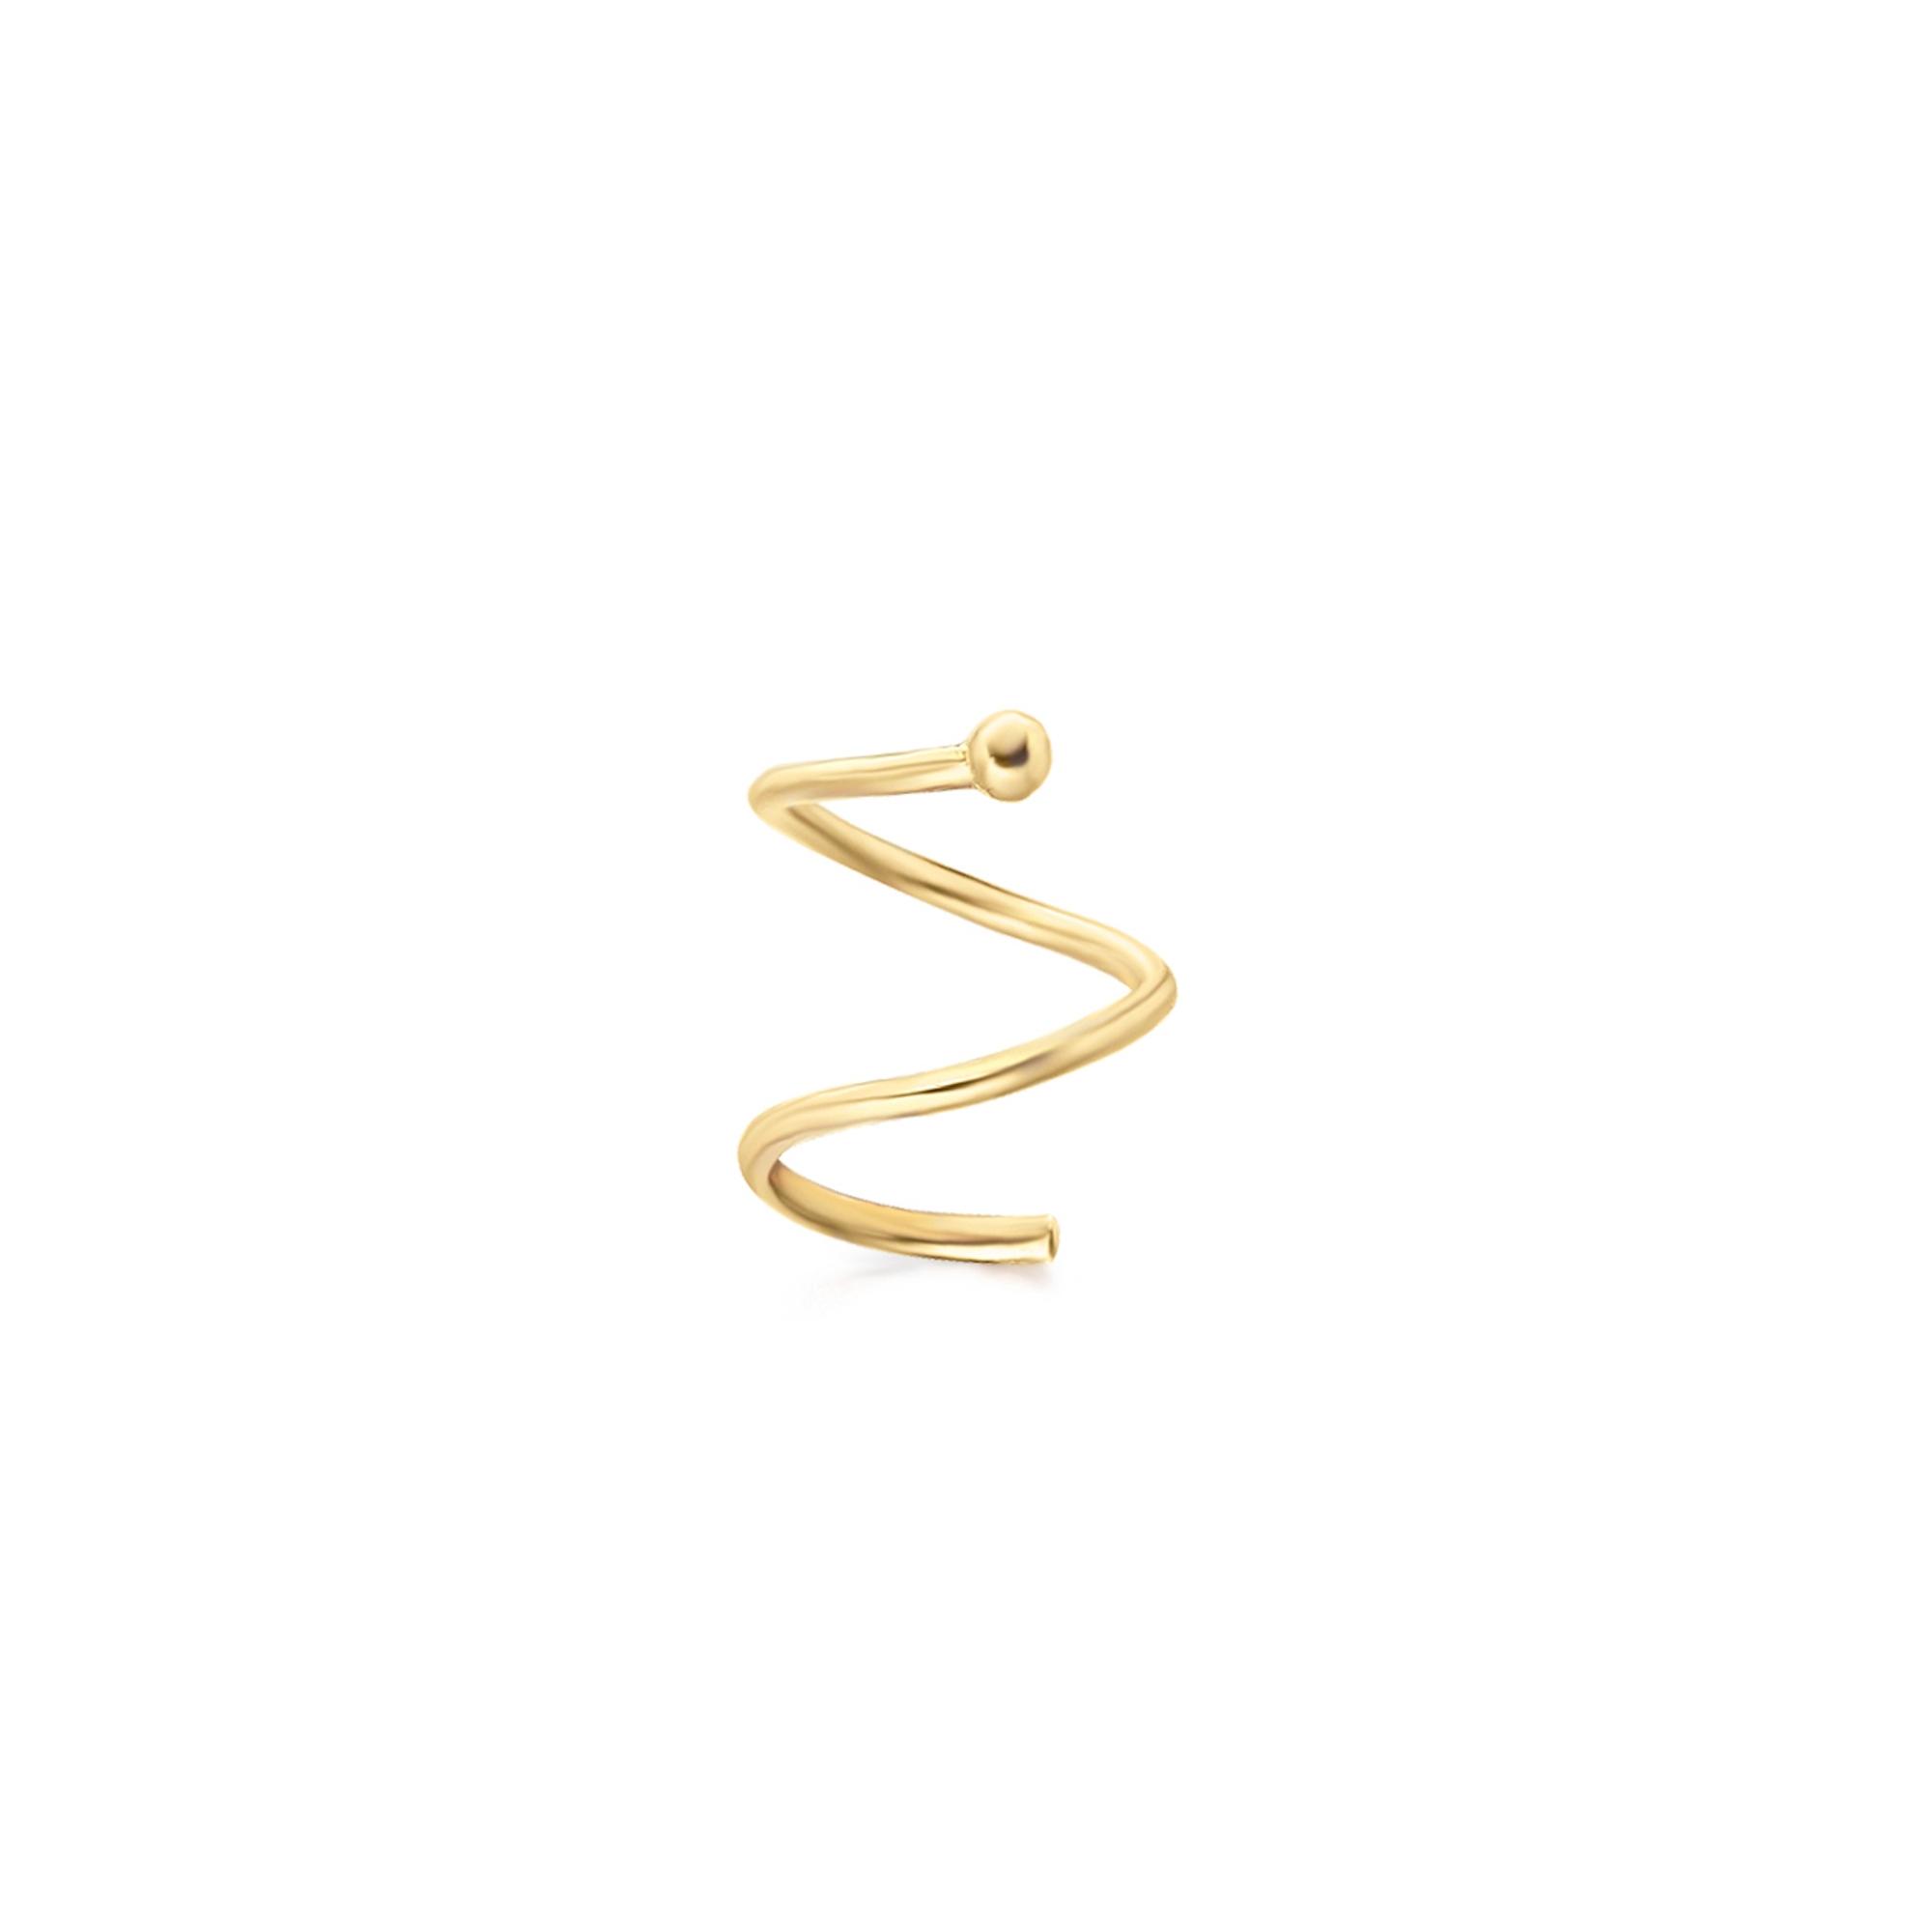 GB050OA mono orecchino a spirare oro giallo single earring gold spiral